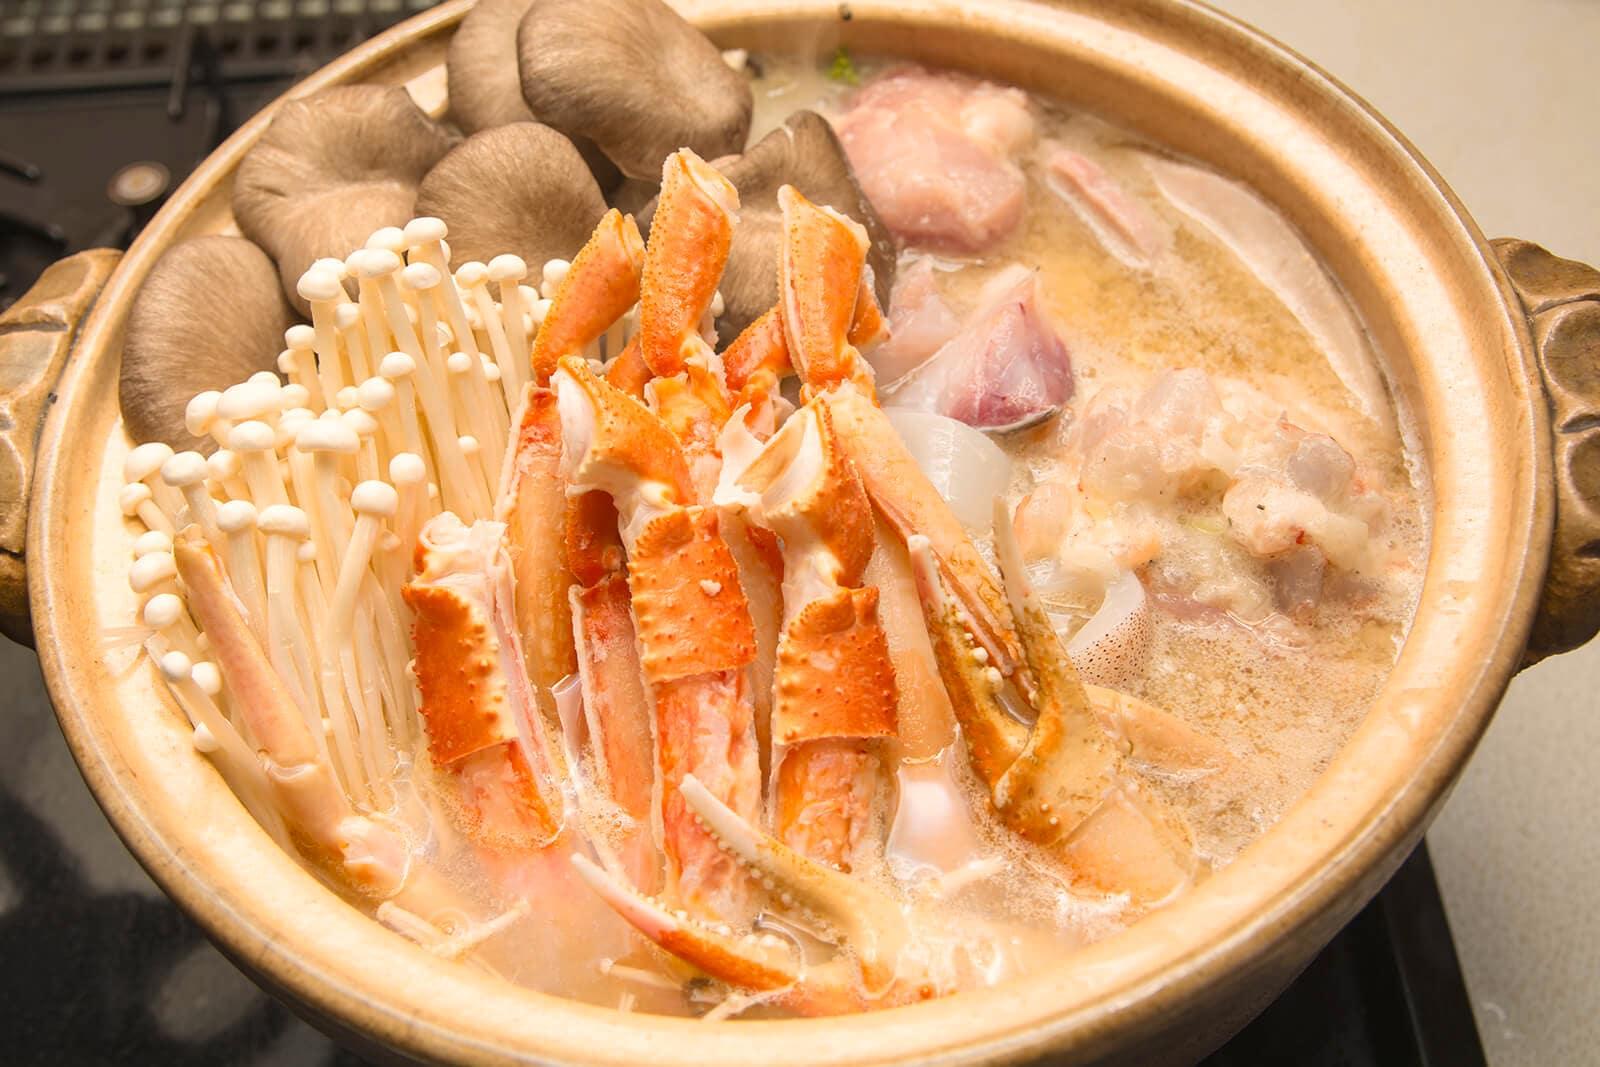 Makanan hotpot kepiting tengah dimasak bersama jenis-jenis jamur seperti shiitake dan enoki